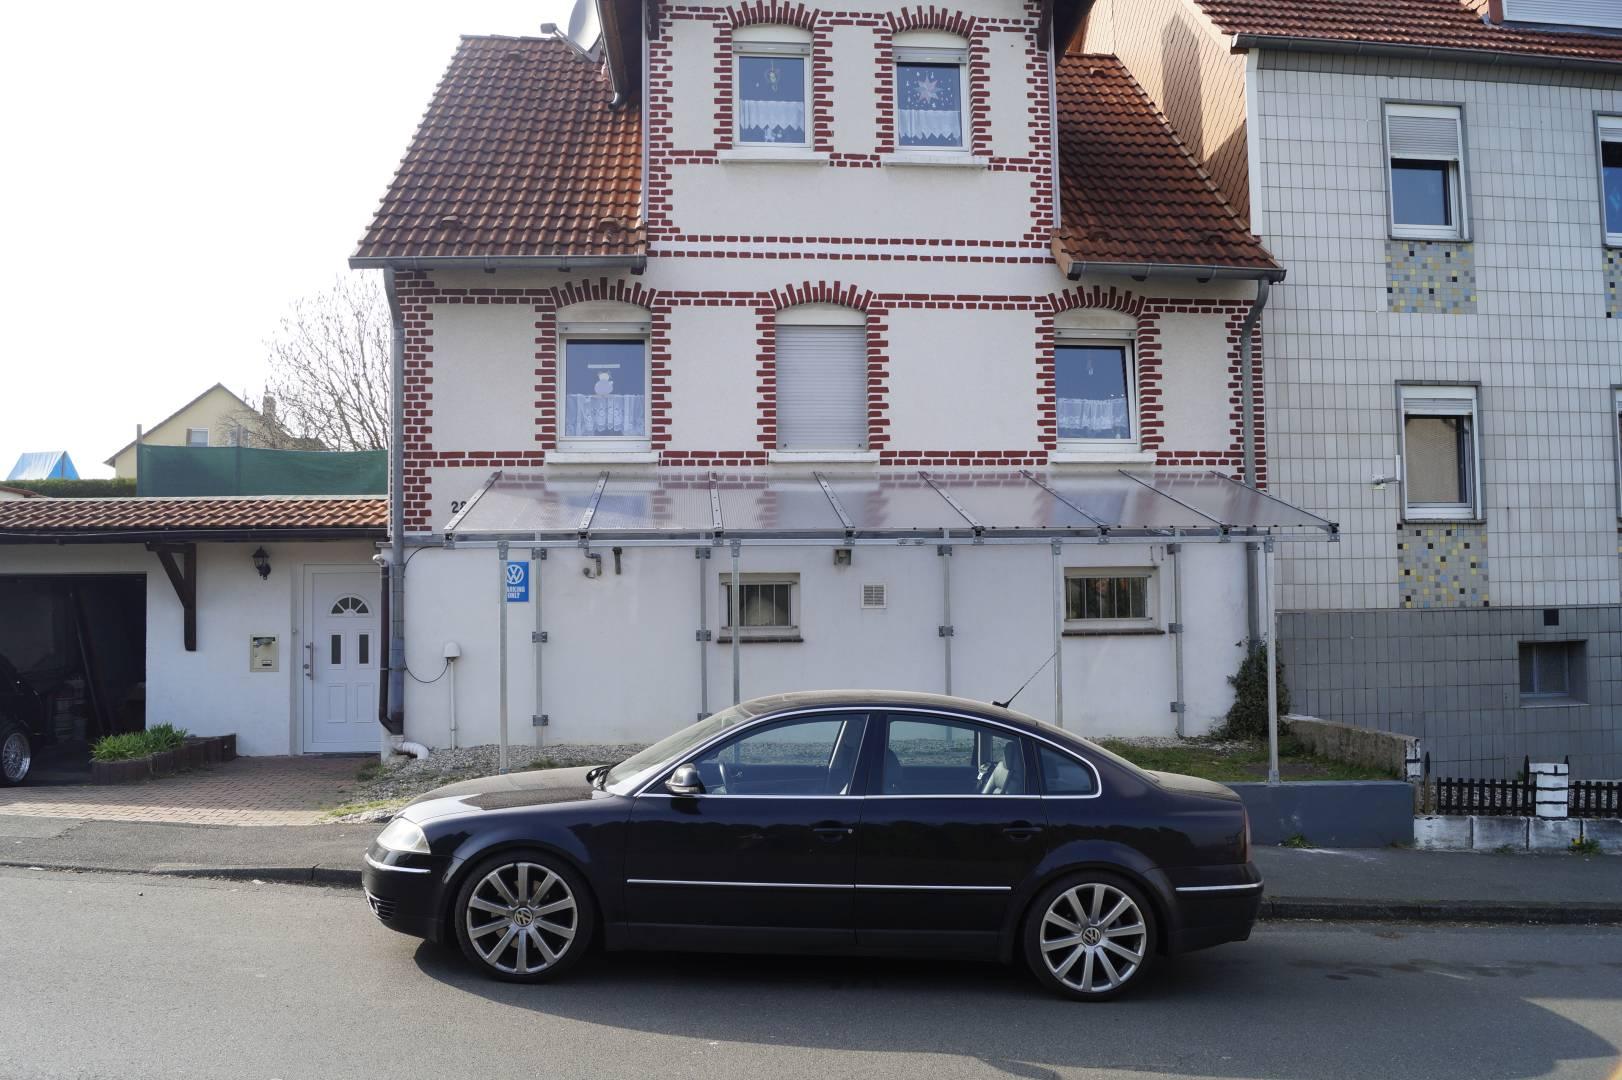 Carport_Aufbau_E02.jpg